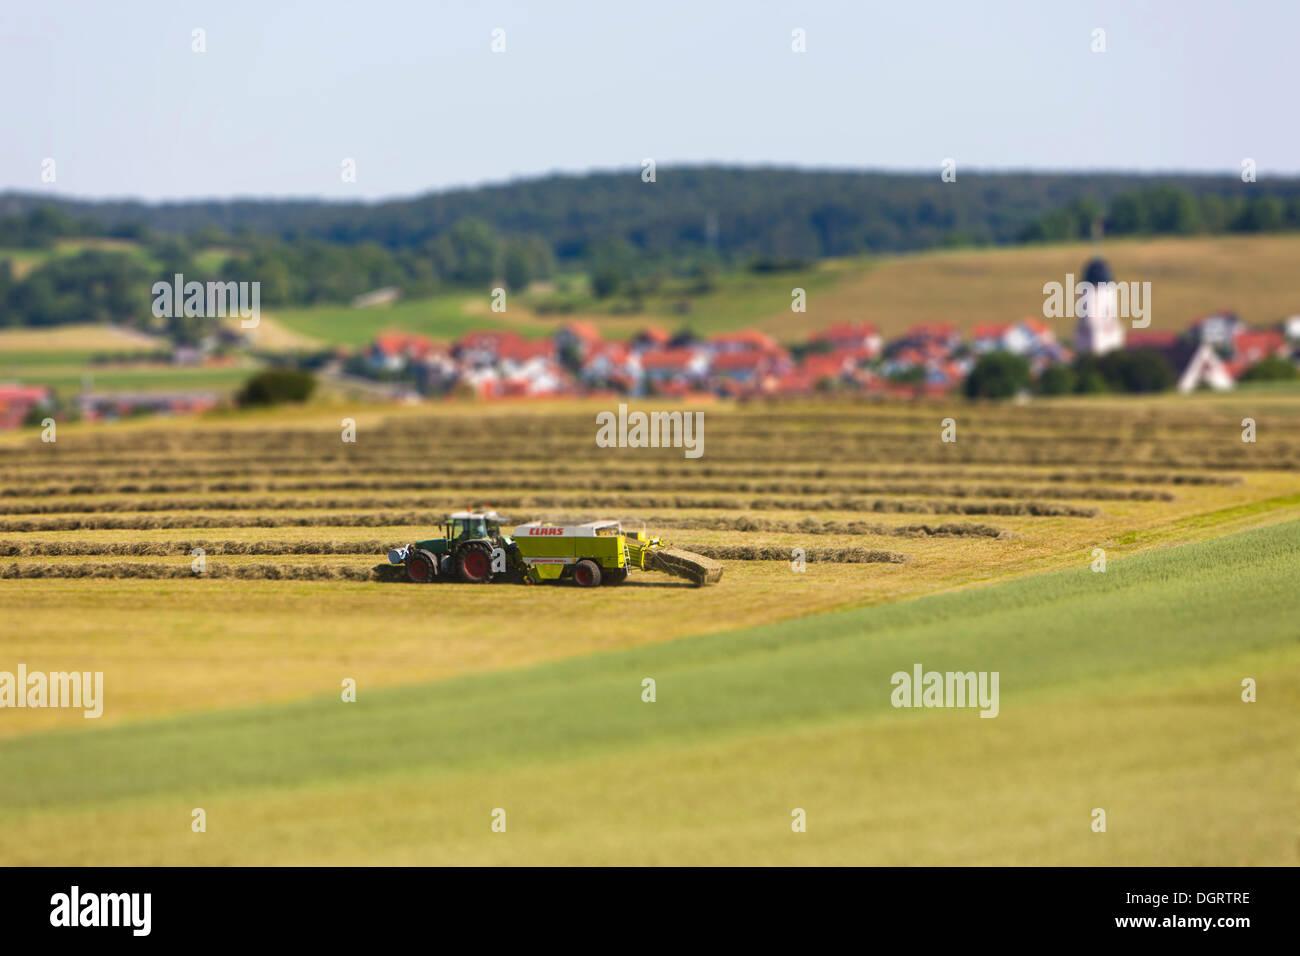 Macchina agricola a lavorare nei campi, tilt-shift effetto, Honau, Baden-Wuerttemberg, PublicGround Immagini Stock